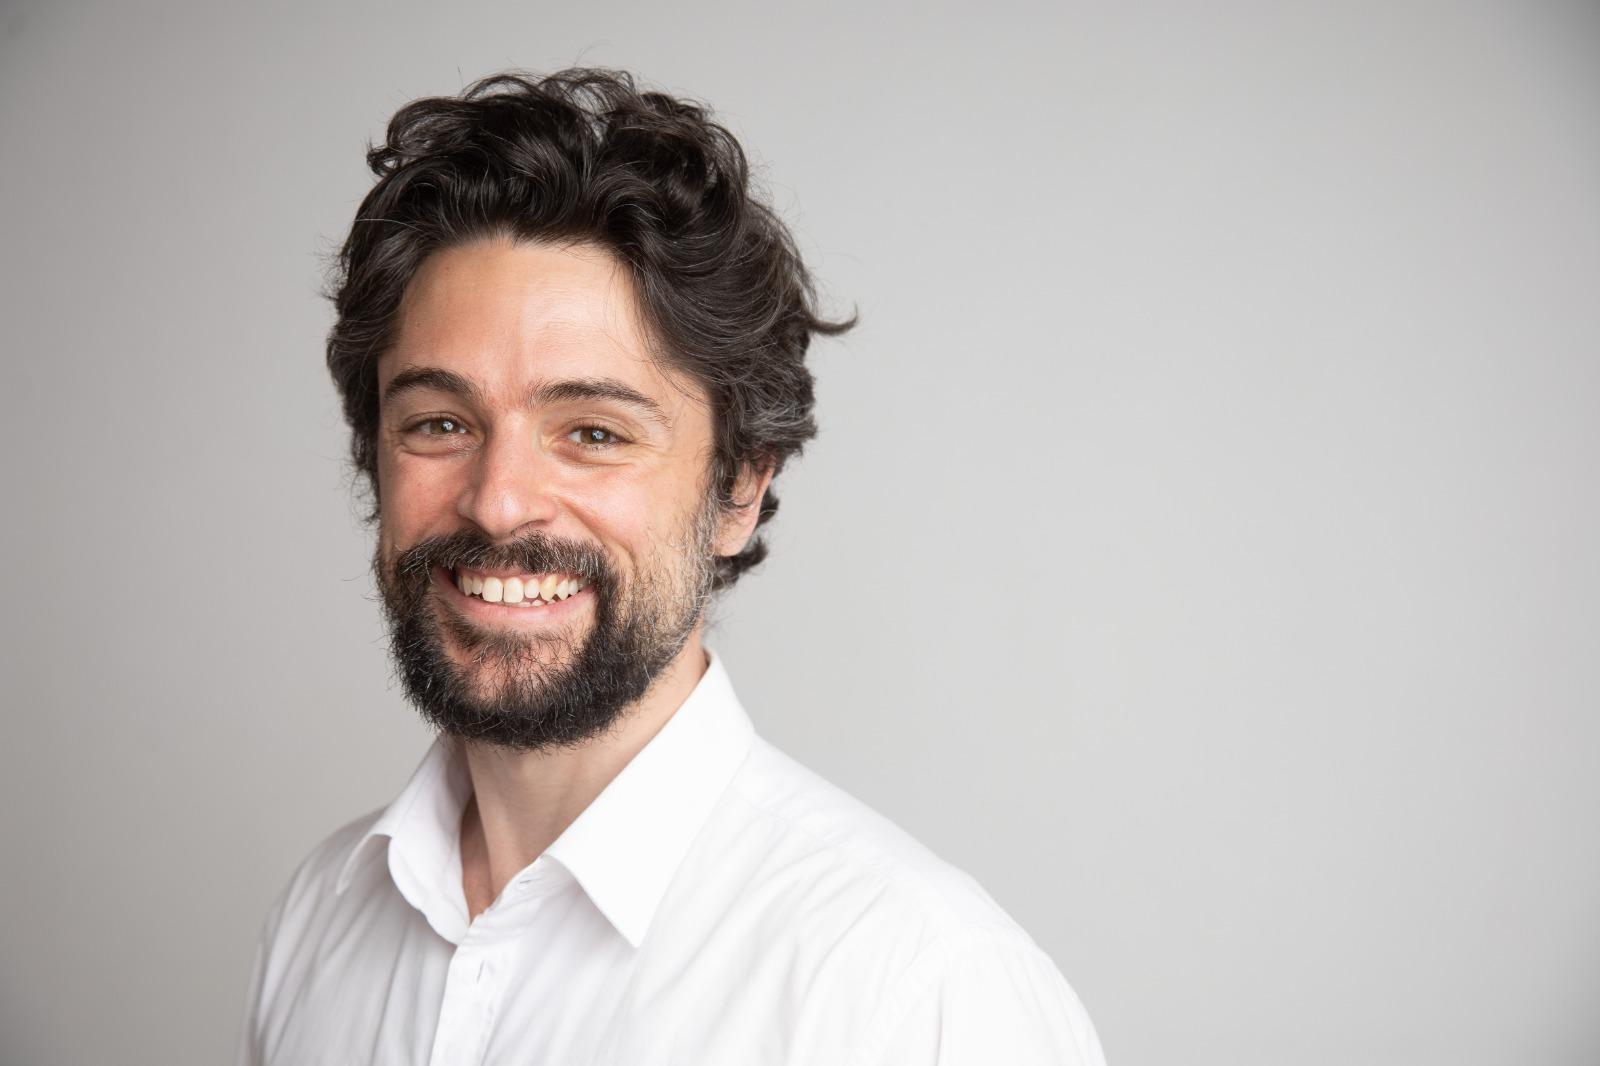 Dott. Massimo Crosara